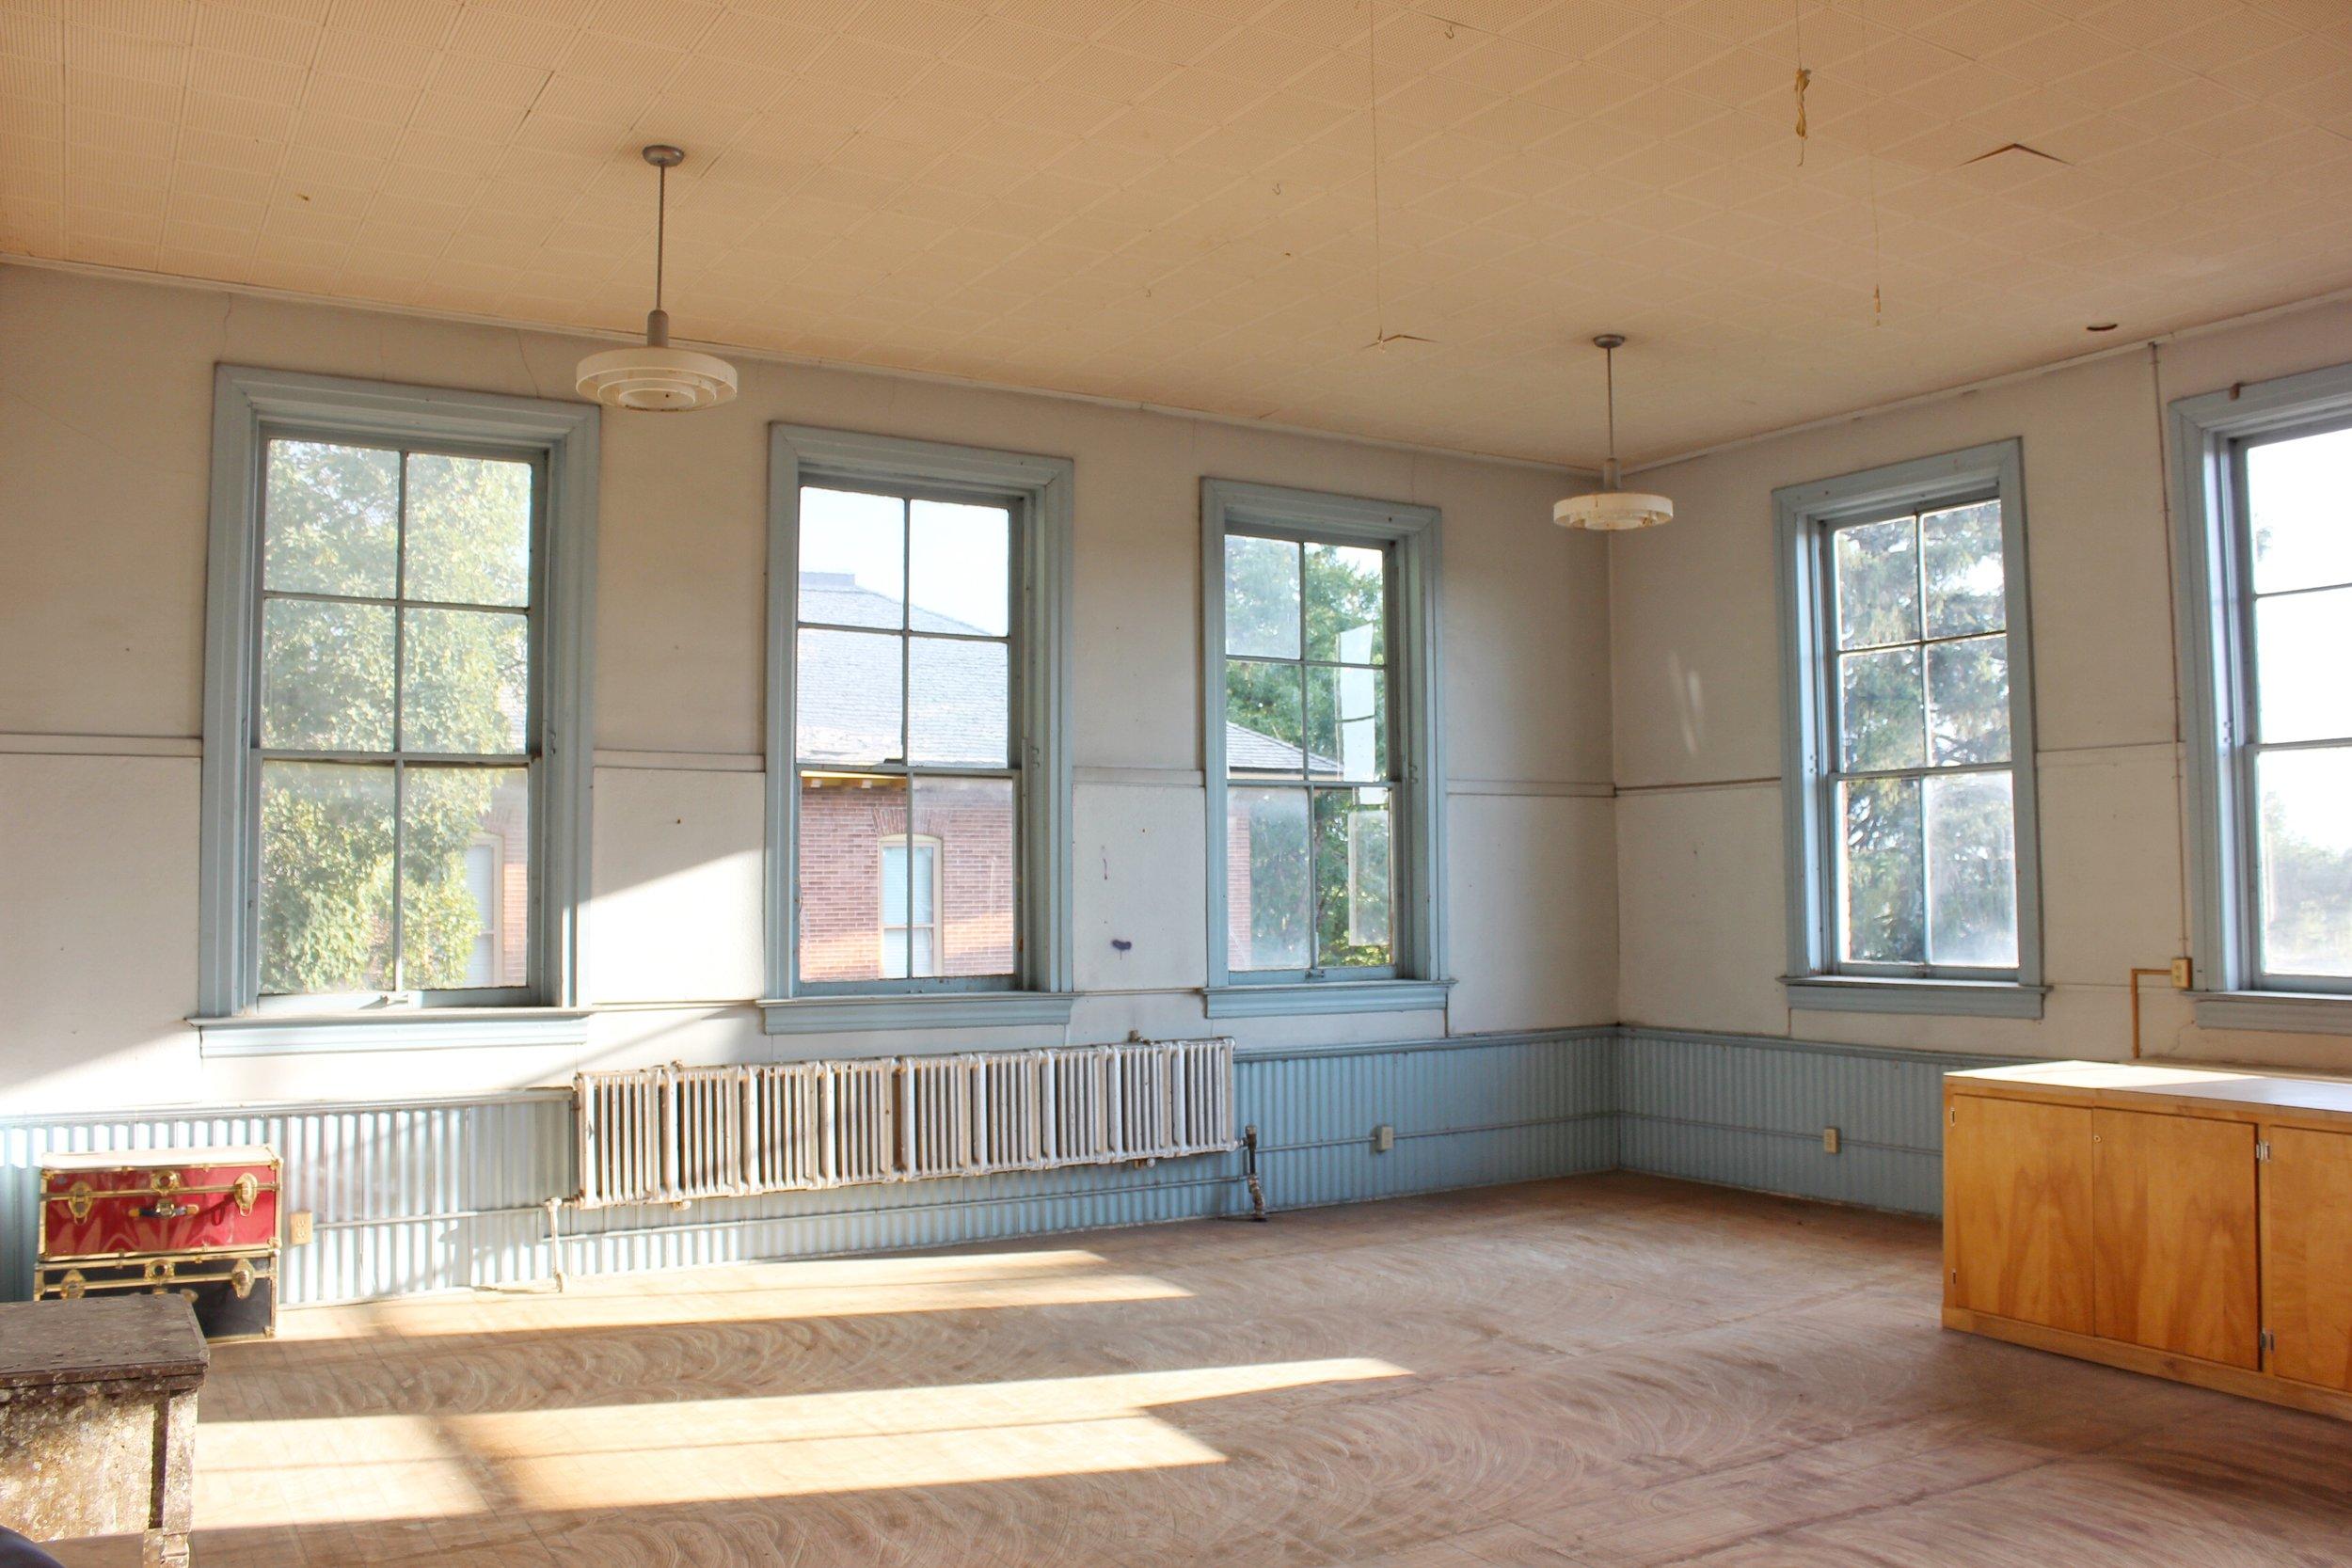 Southwest Blue Room